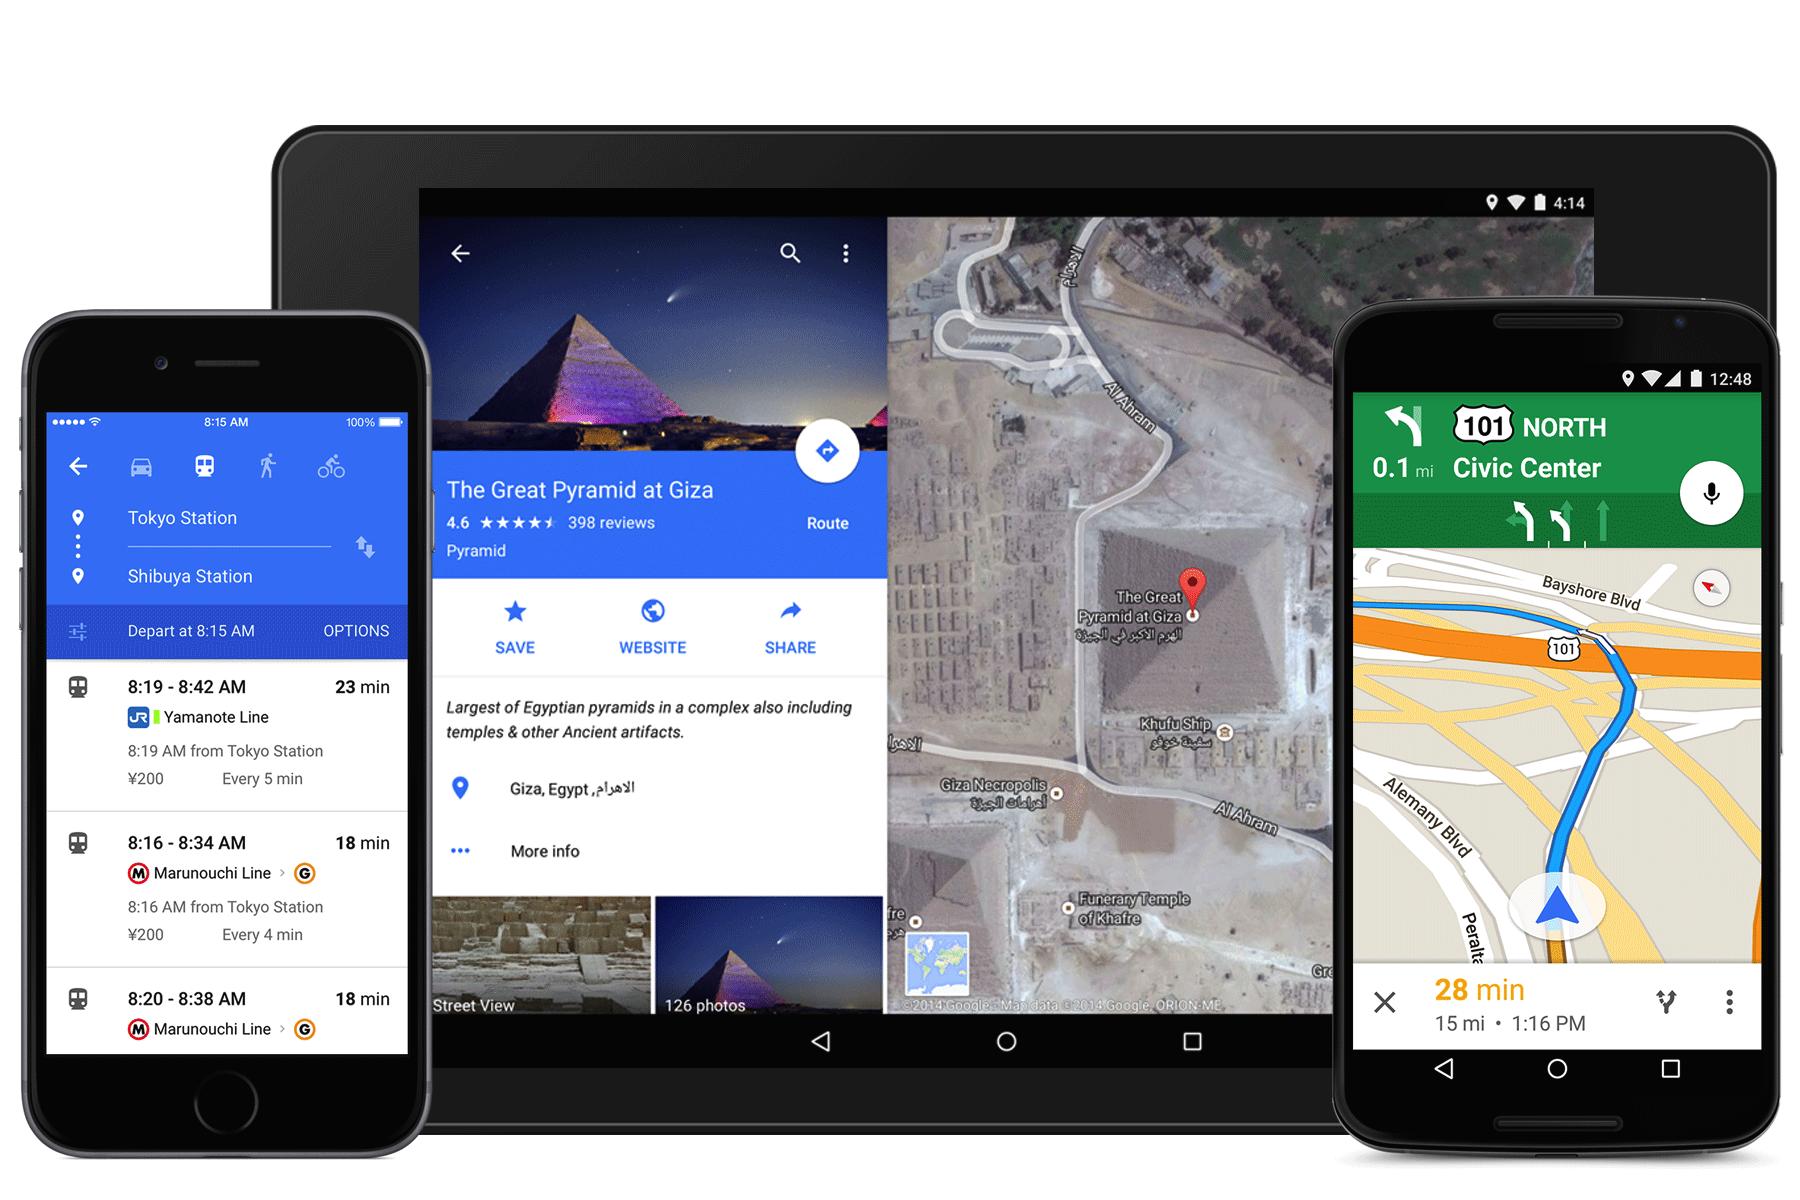 Redesigned Google Maps app